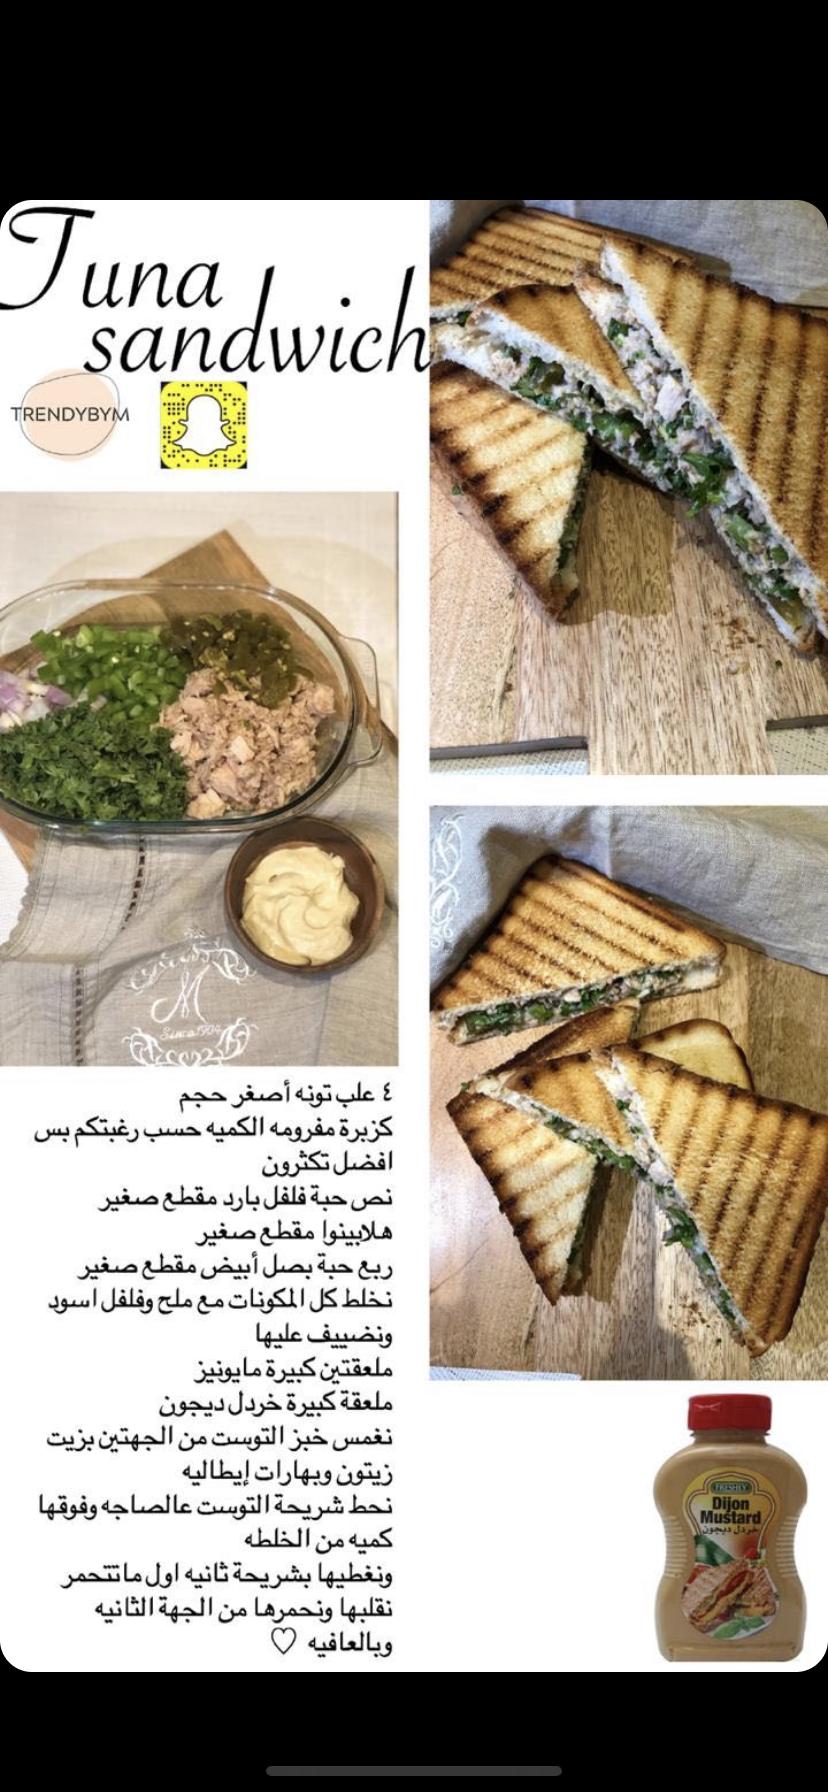 Pin By Sawari On طبخات وسويتز Cooking Food Dijon Mustard